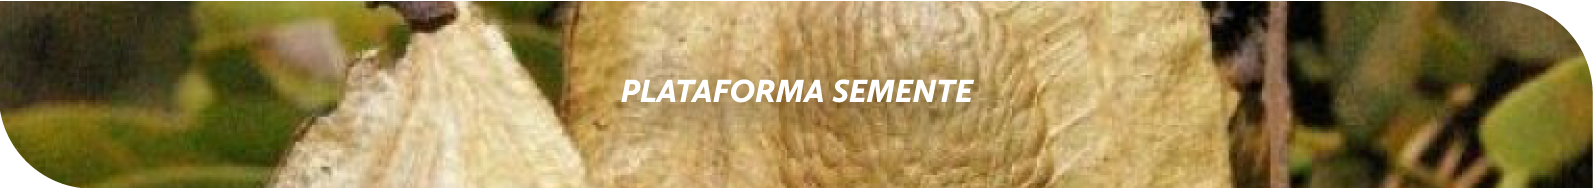 Barra - Semente